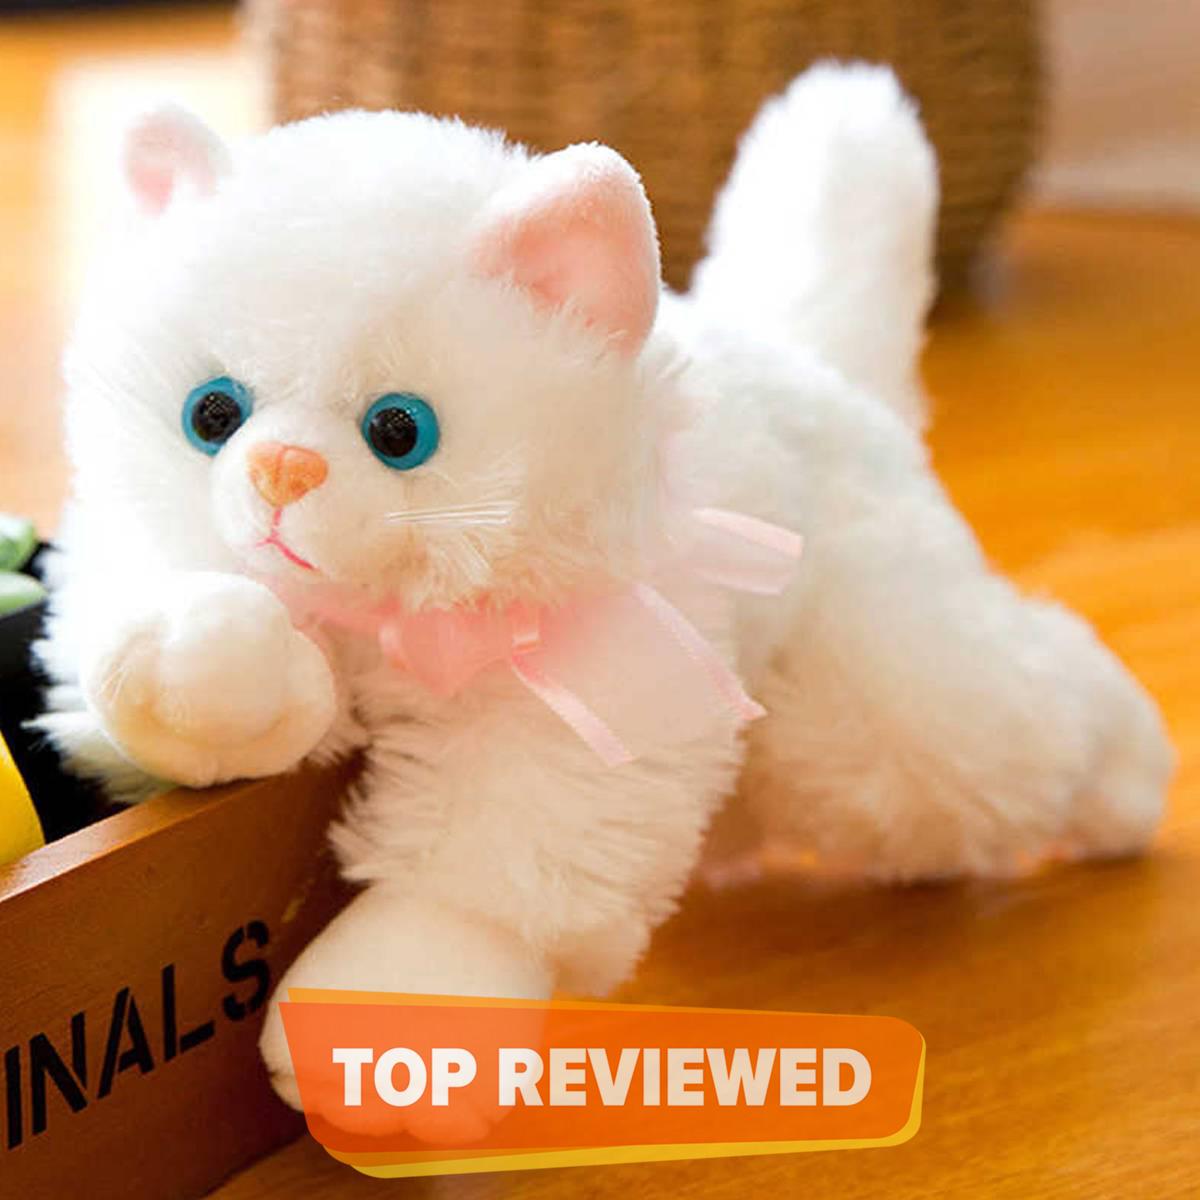 Cat Stuffed Animal Soft Cat Plush Toy Persian Cat Stuff Toy White Color 25 cm